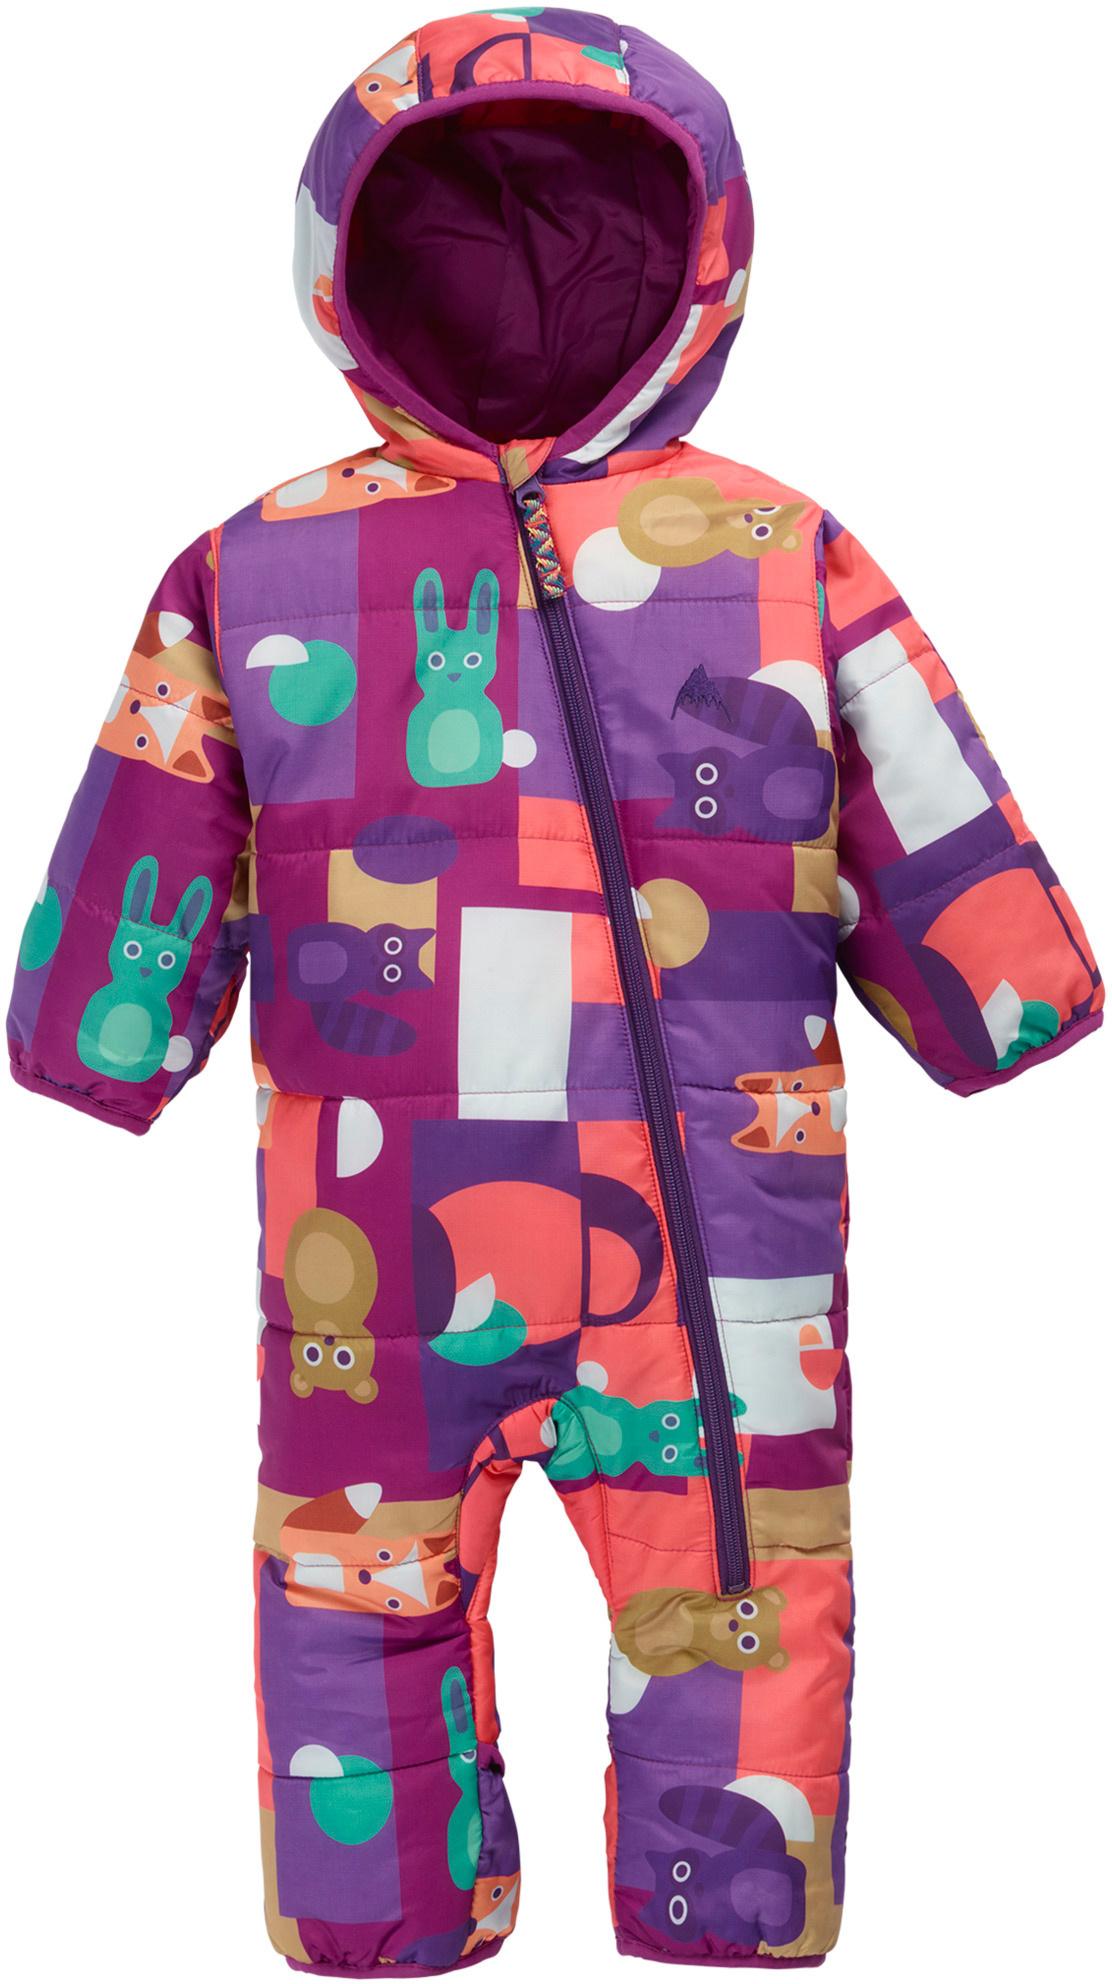 ddbbbc0d61b4 Burton Minishred Infant Buddy Bunting Snow Suit -  99.95 - Thrill On